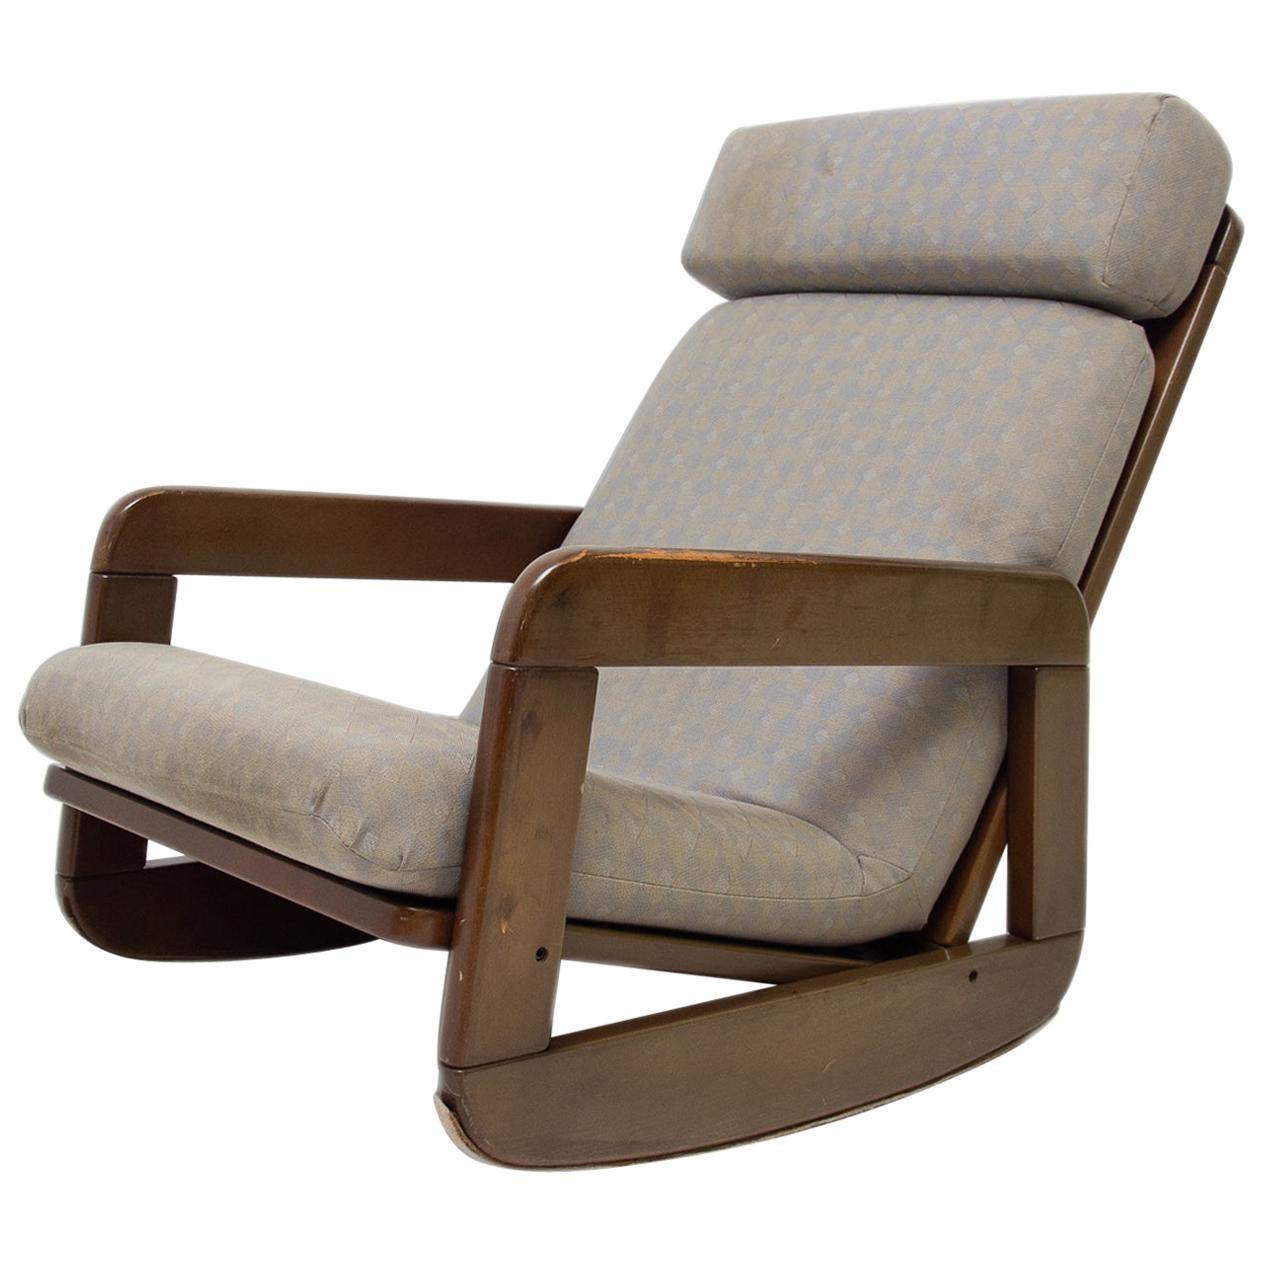 Midcentury Czechoslovak Rocking Chair, 1960s